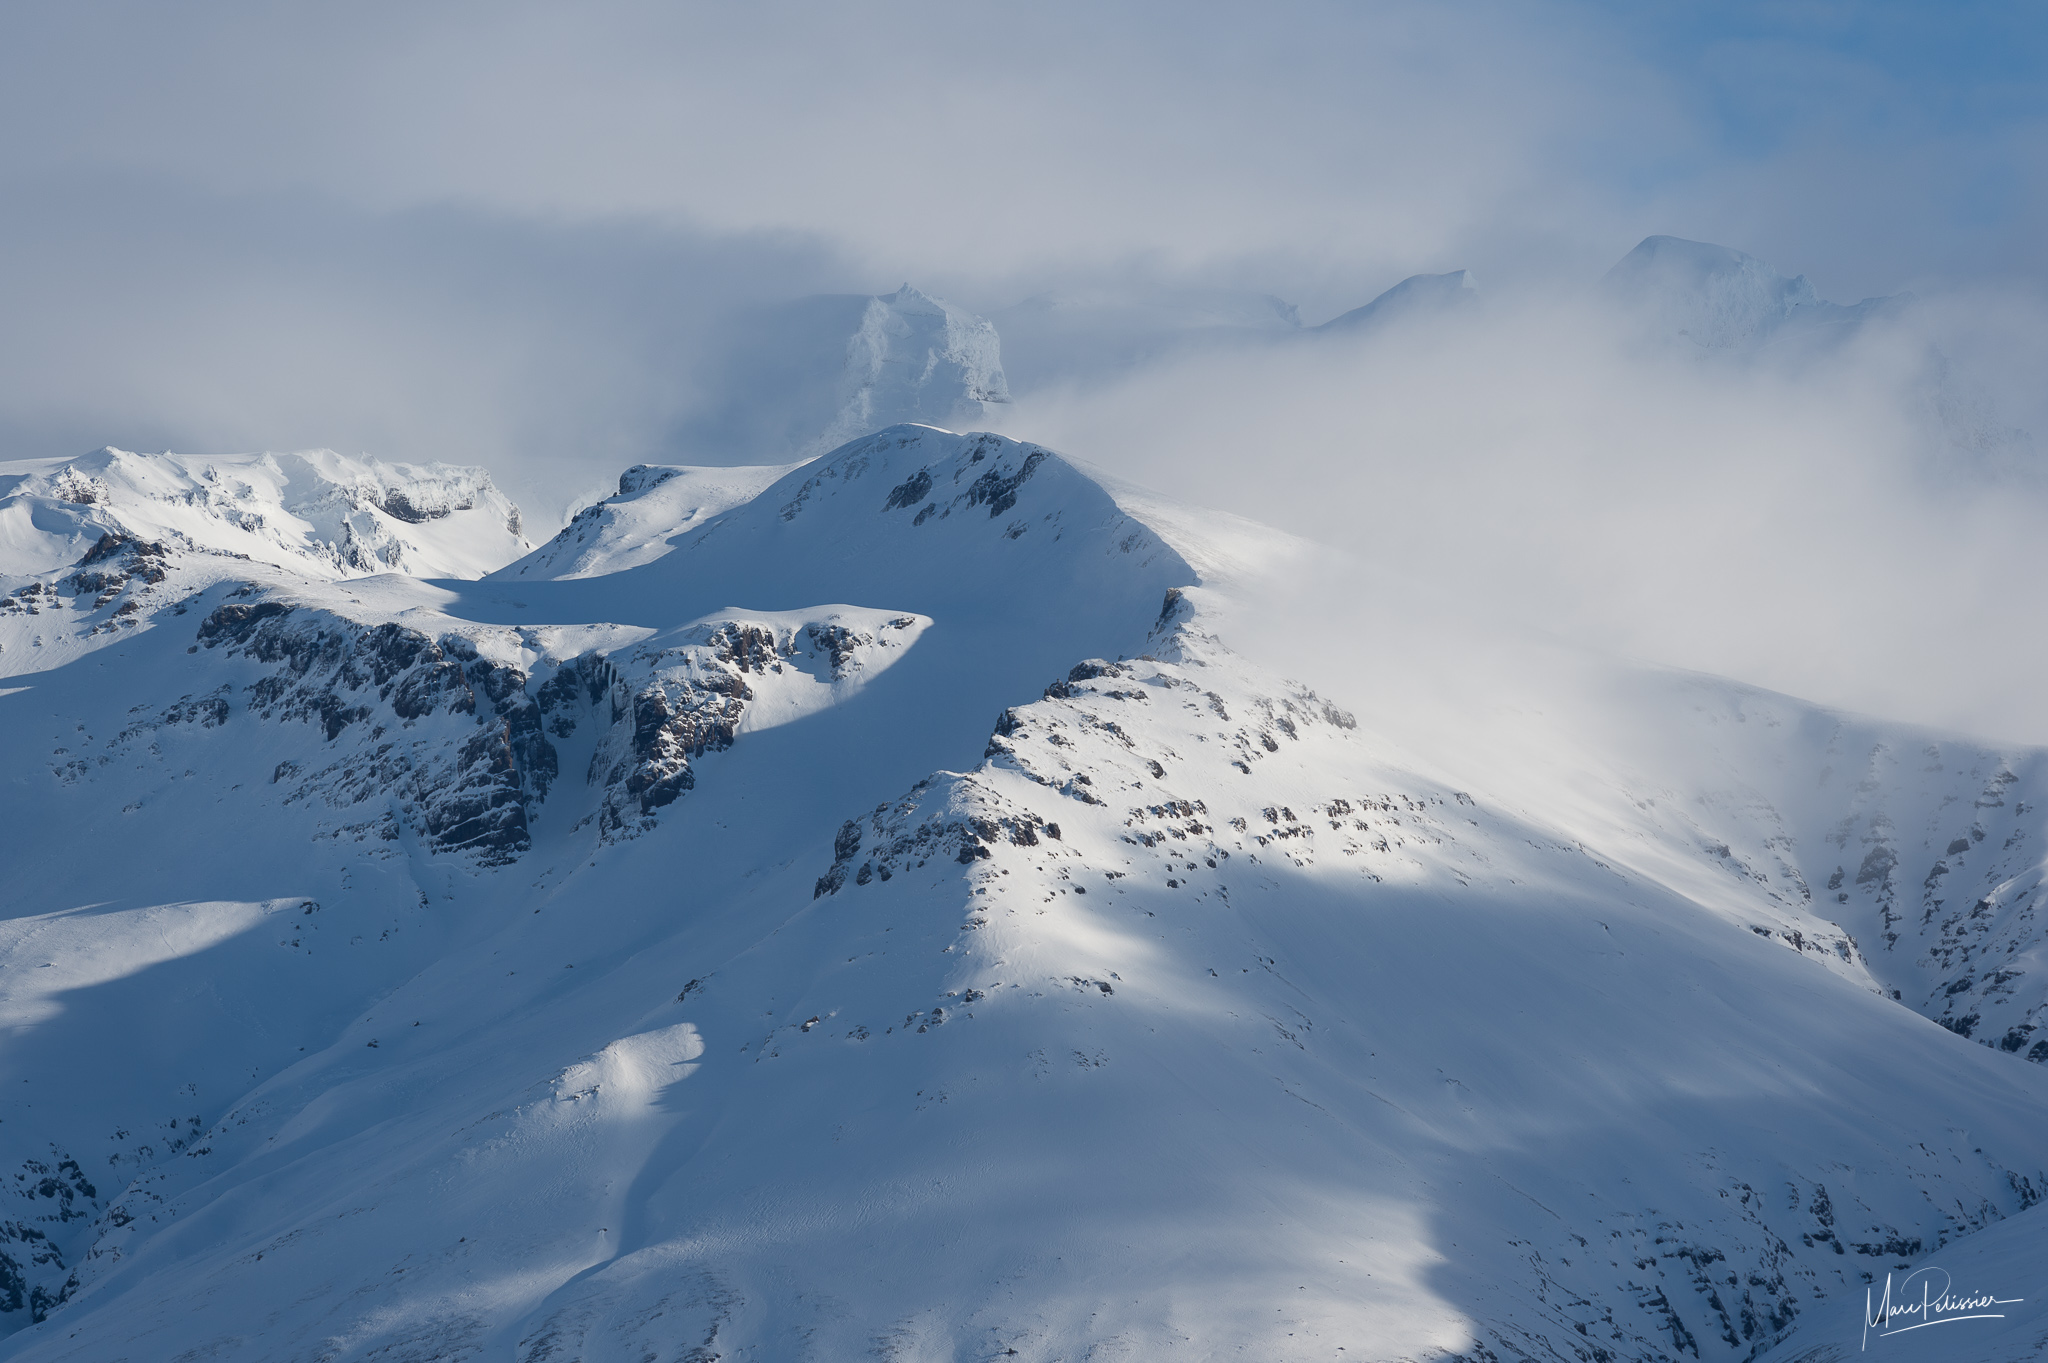 Snowy mounts above Svínafellsjökull Glacier, Iceland